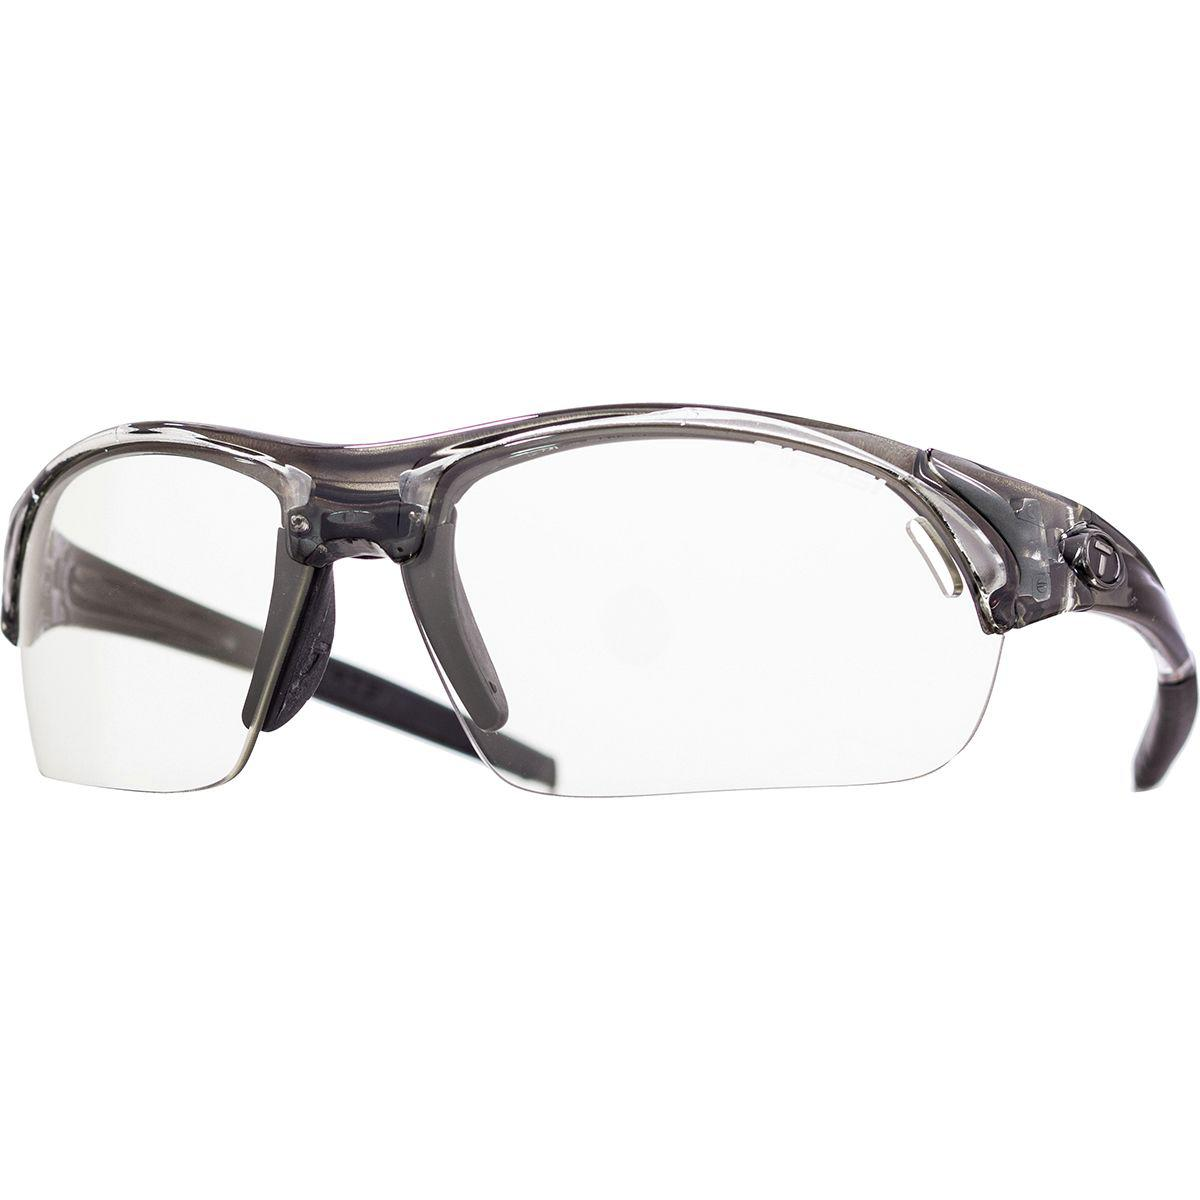 bed9facb09 Lyst - Tifosi Optics Launch H.s. Sport Sunglasses for Men